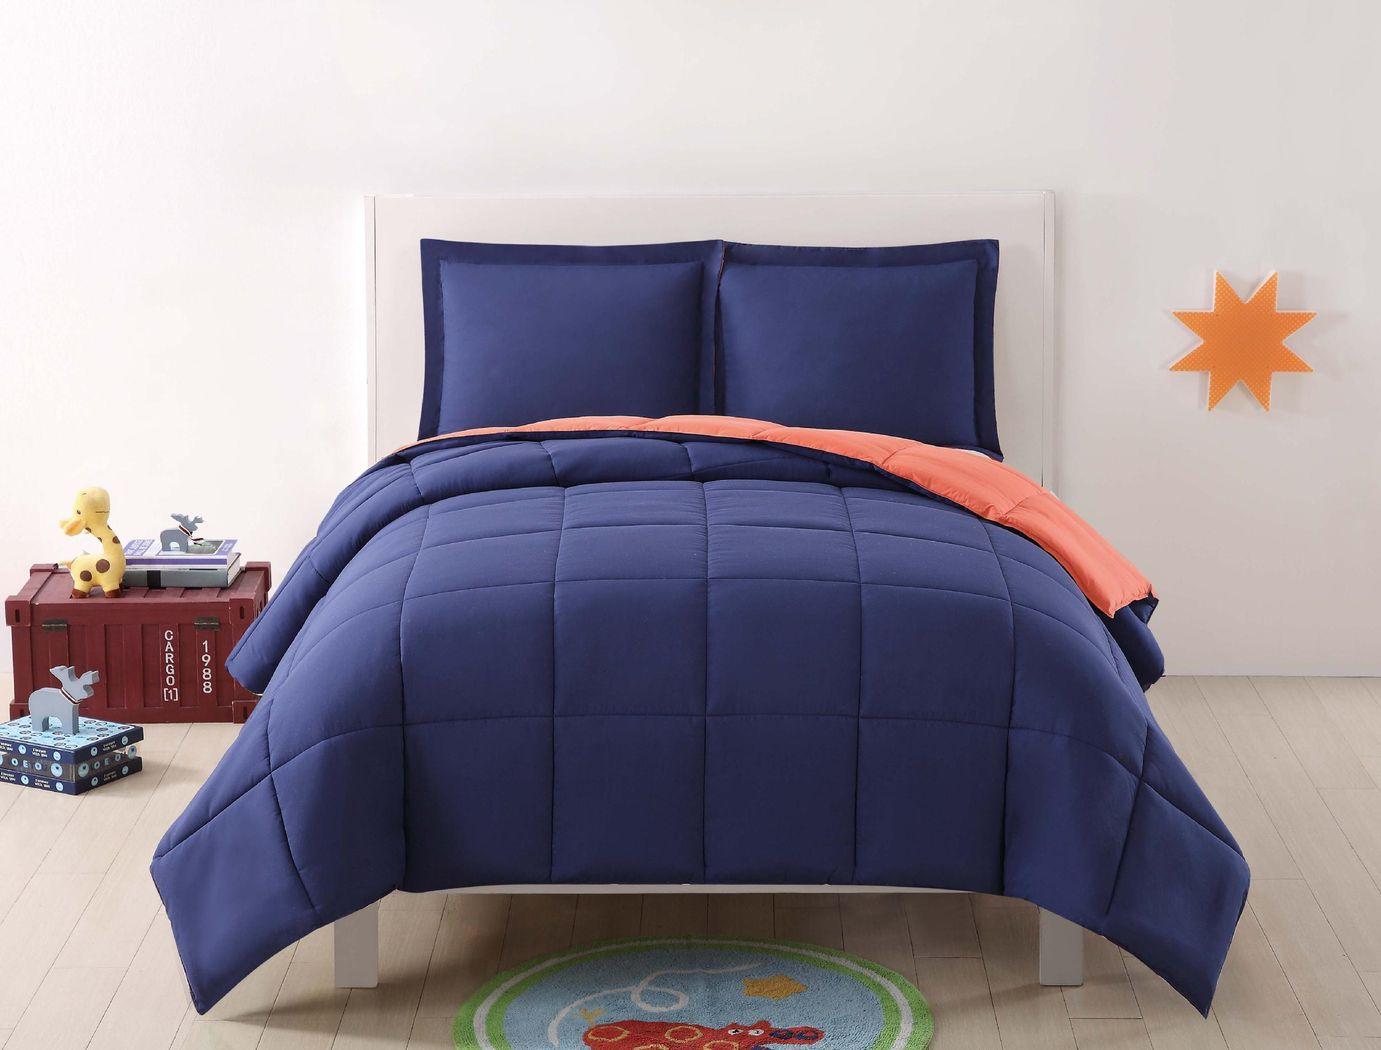 Kids Boyette Navy/Orange 3 Pc Full/Queen Comforter Set